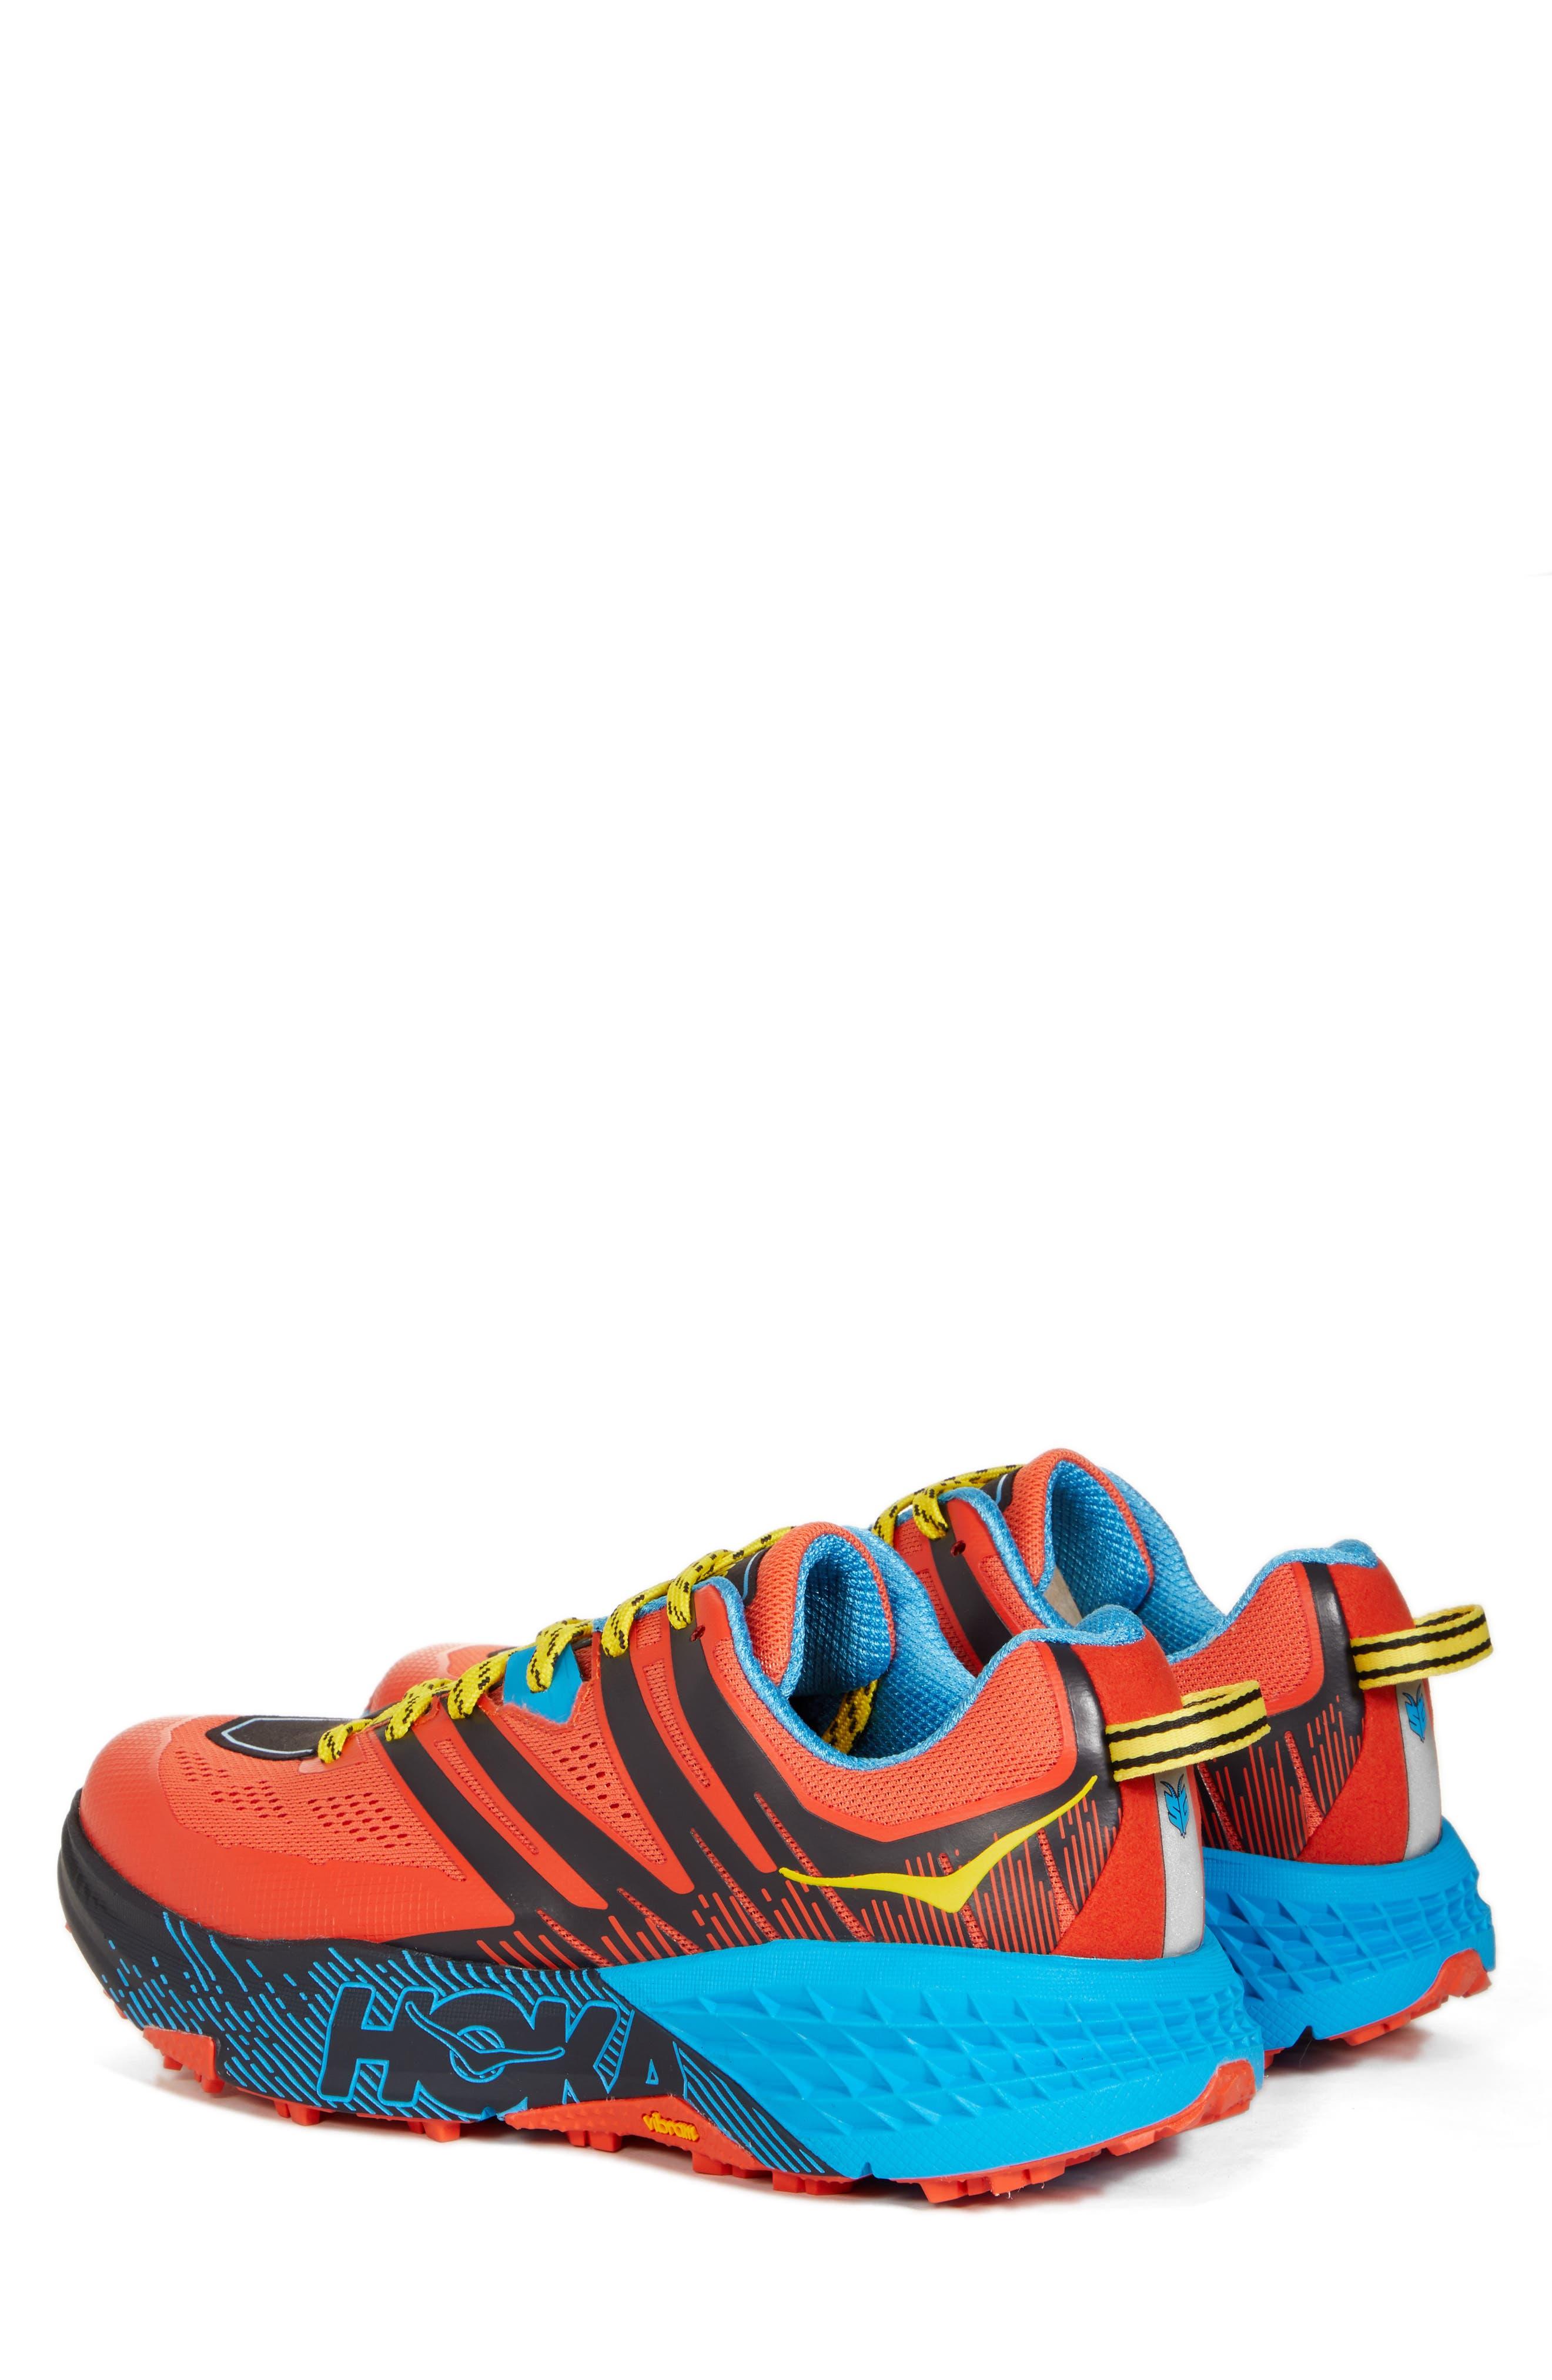 HOKA ONE ONE,  Speedgoat 3 Trail Running Shoe, Alternate thumbnail 3, color, 825